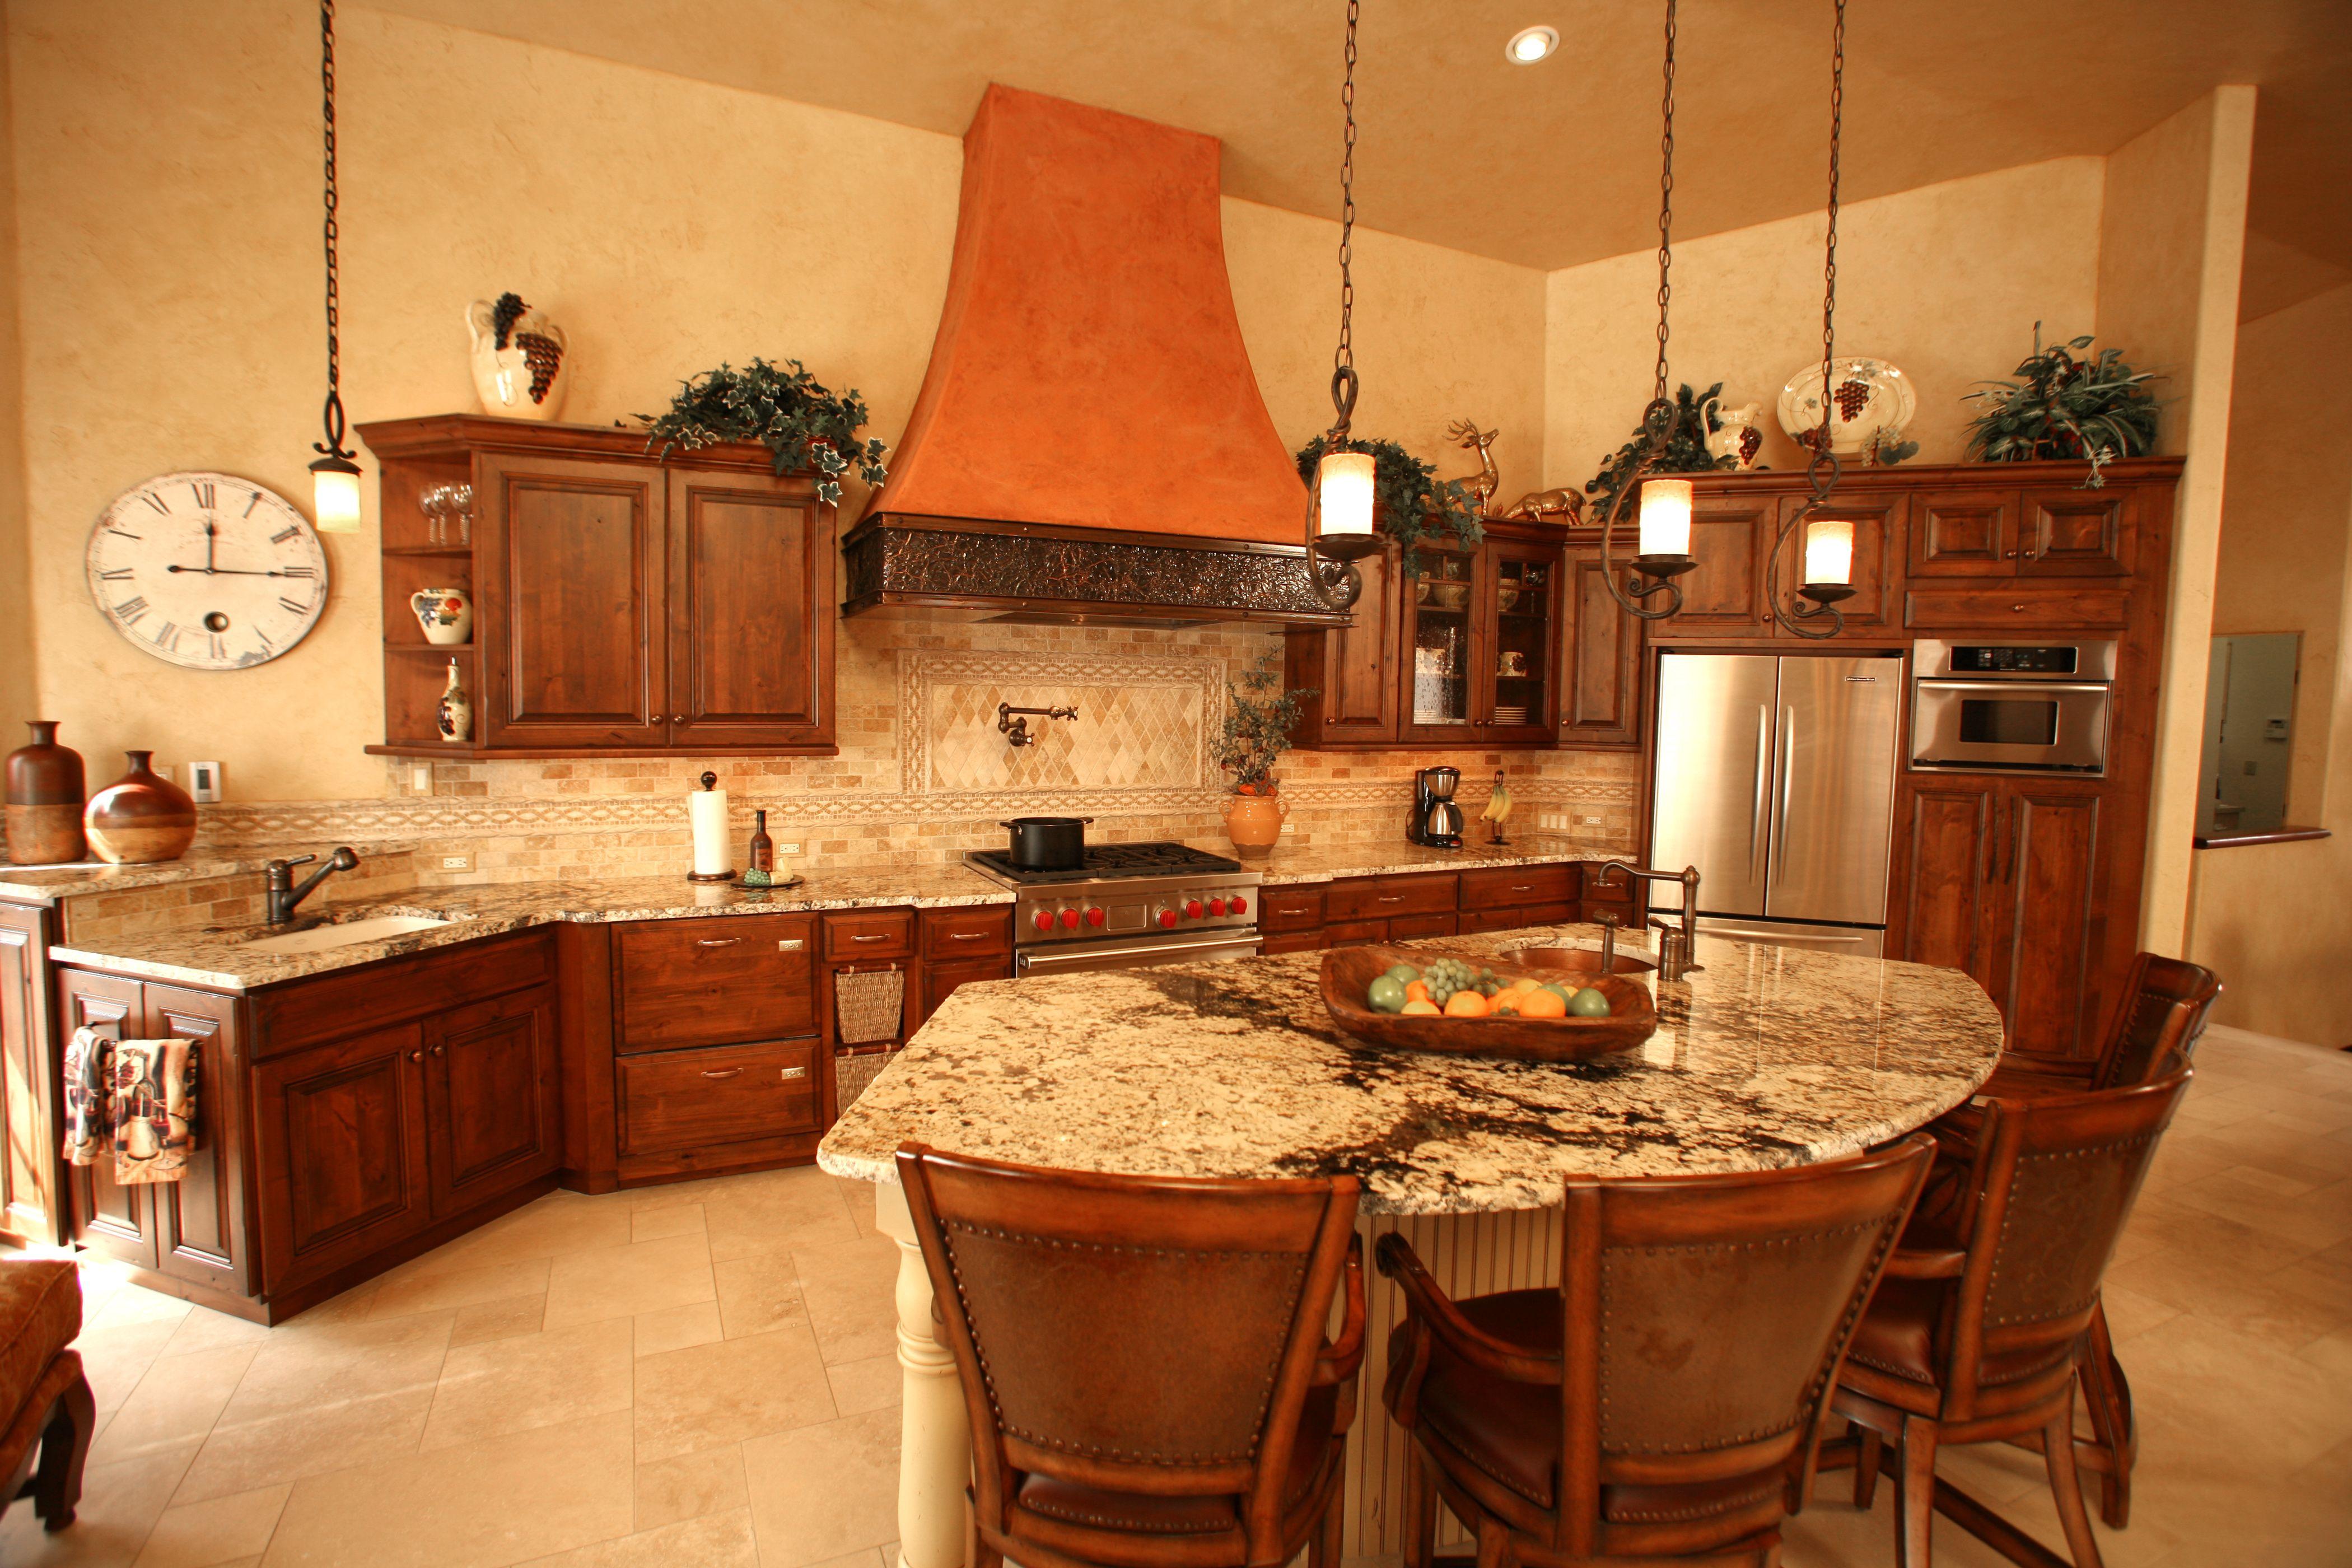 Home Speasinteriordesign Tuscan Kitchen Kitchen Design Decor Copper Kitchen Decor